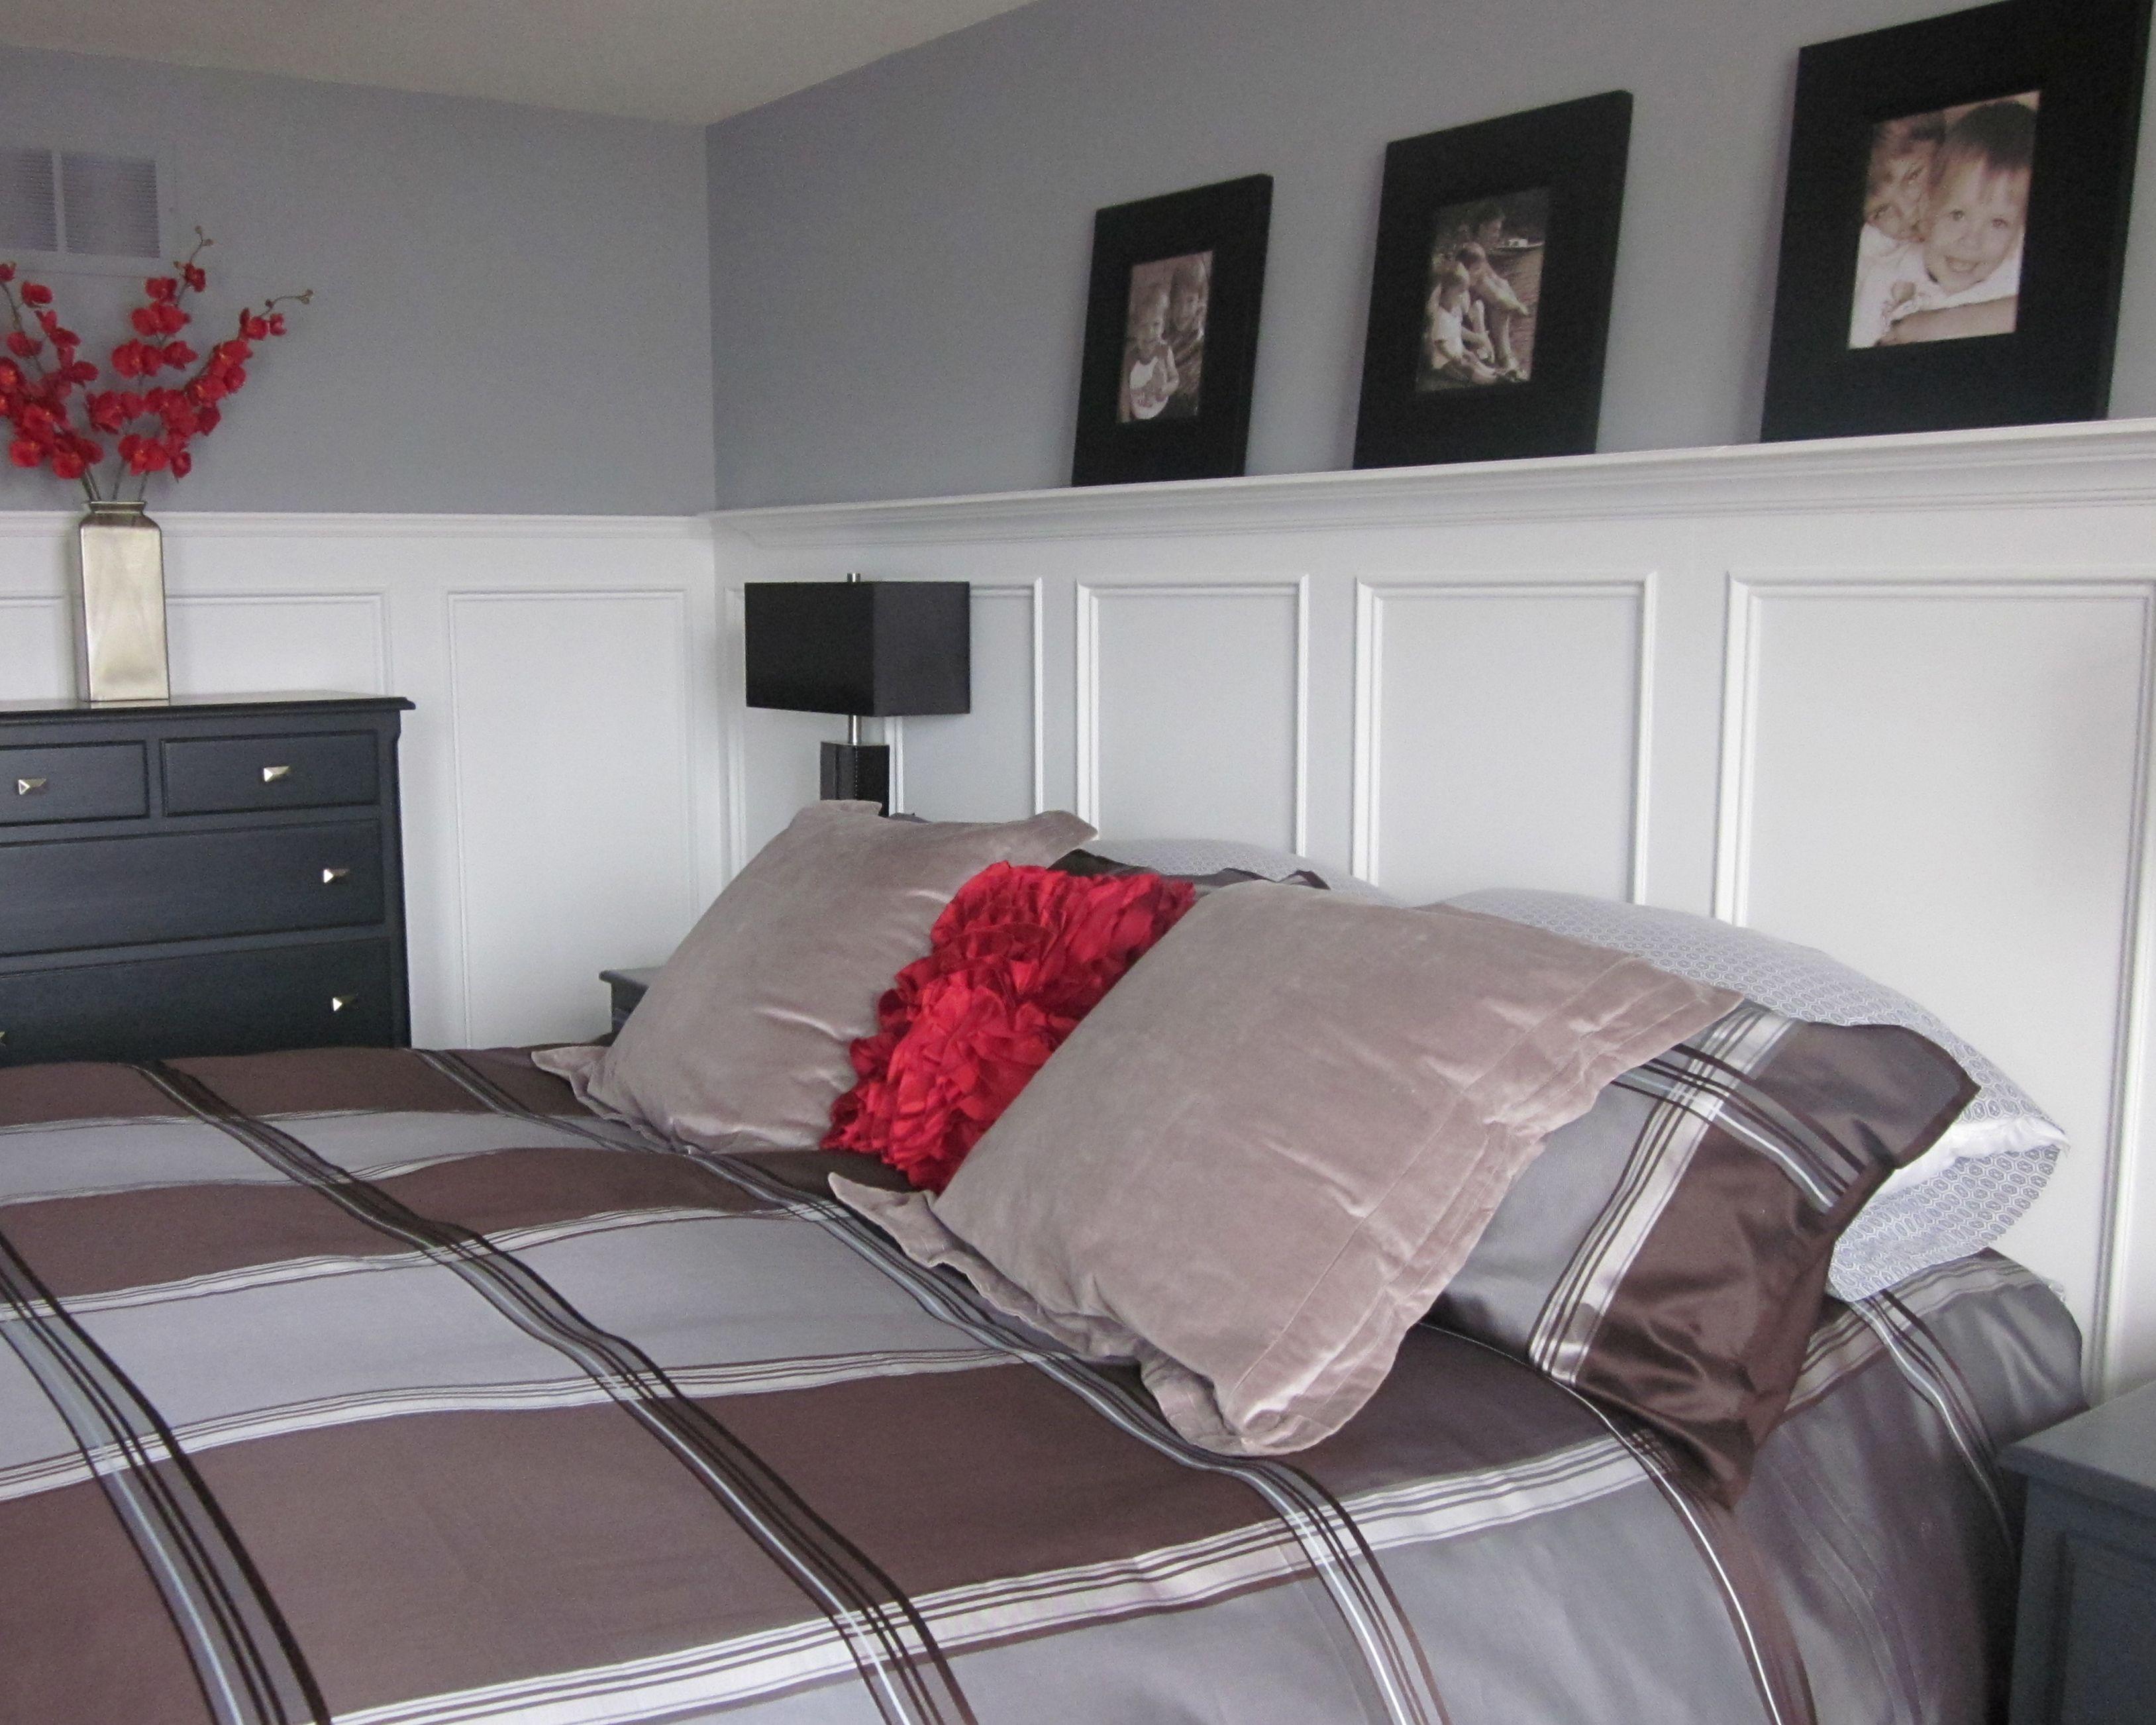 Wainscoting master bedroom - Hmmm Wainscoting In The Master Bedroom Interesting